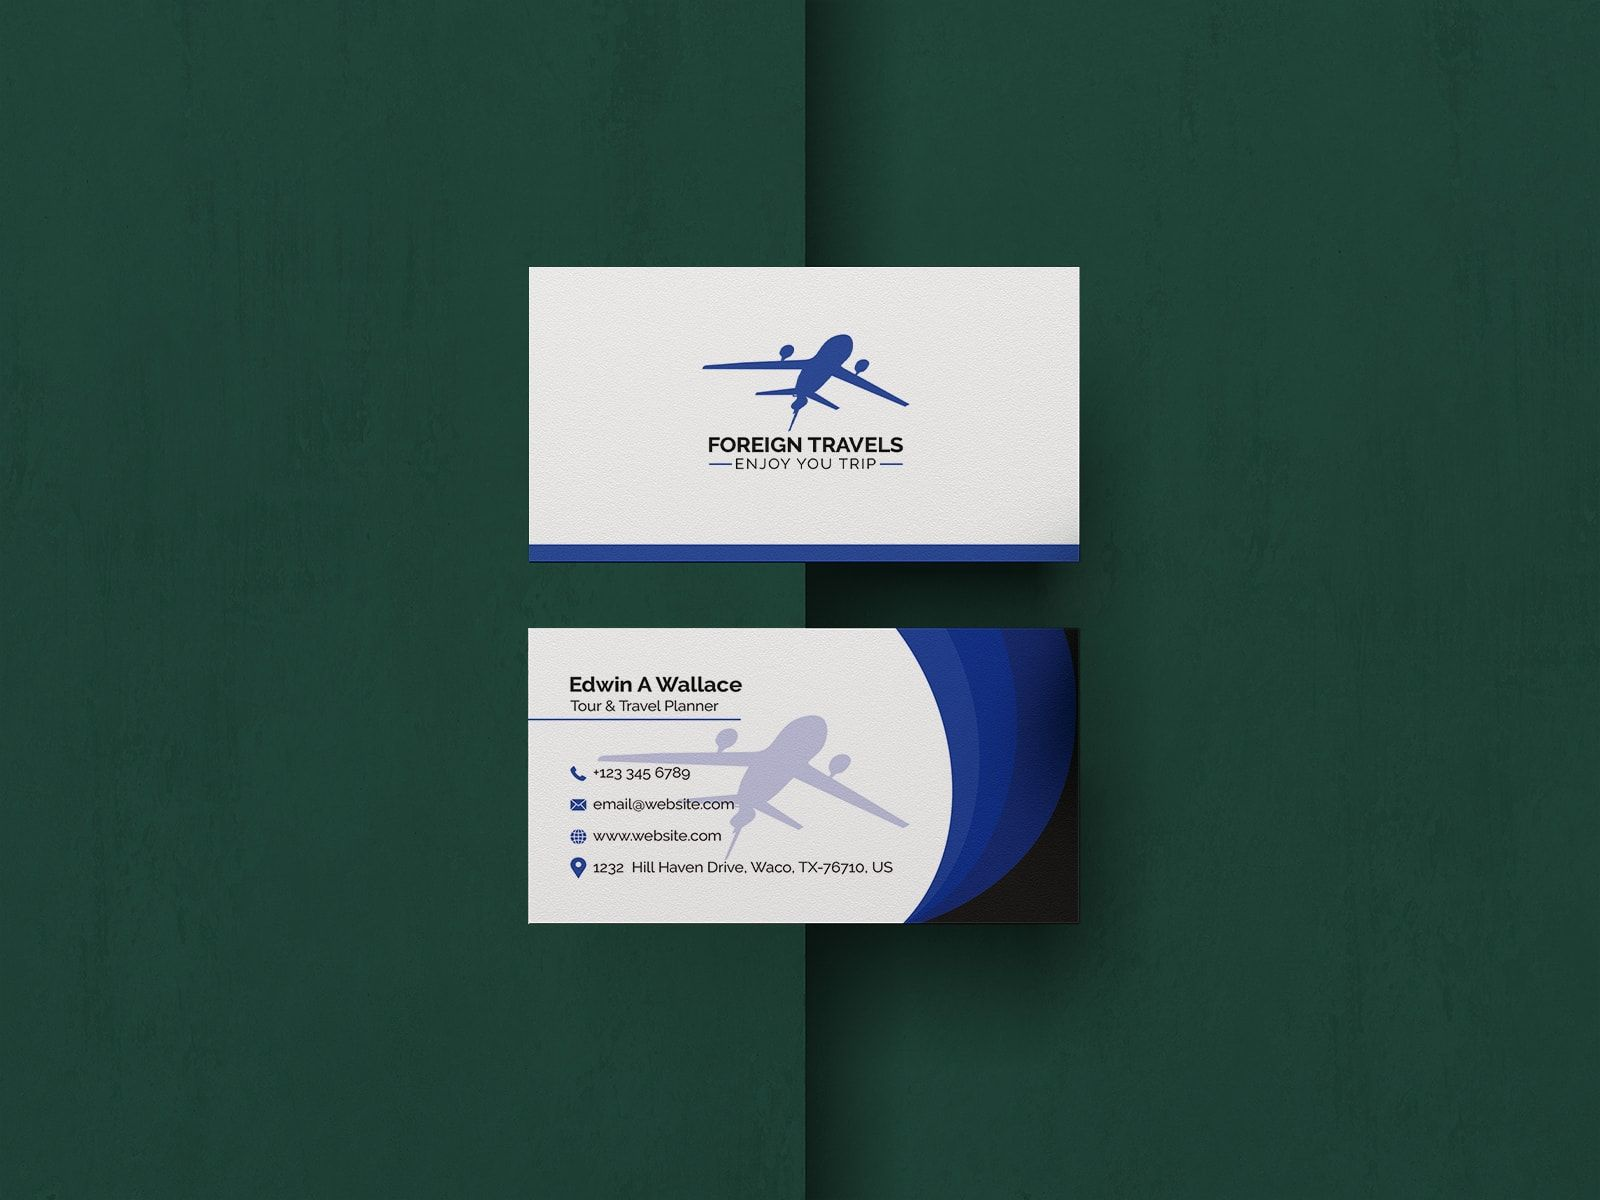 Travel Agency Business Card Design Template Agency Business Cards Business Card Template Design Business Card Design